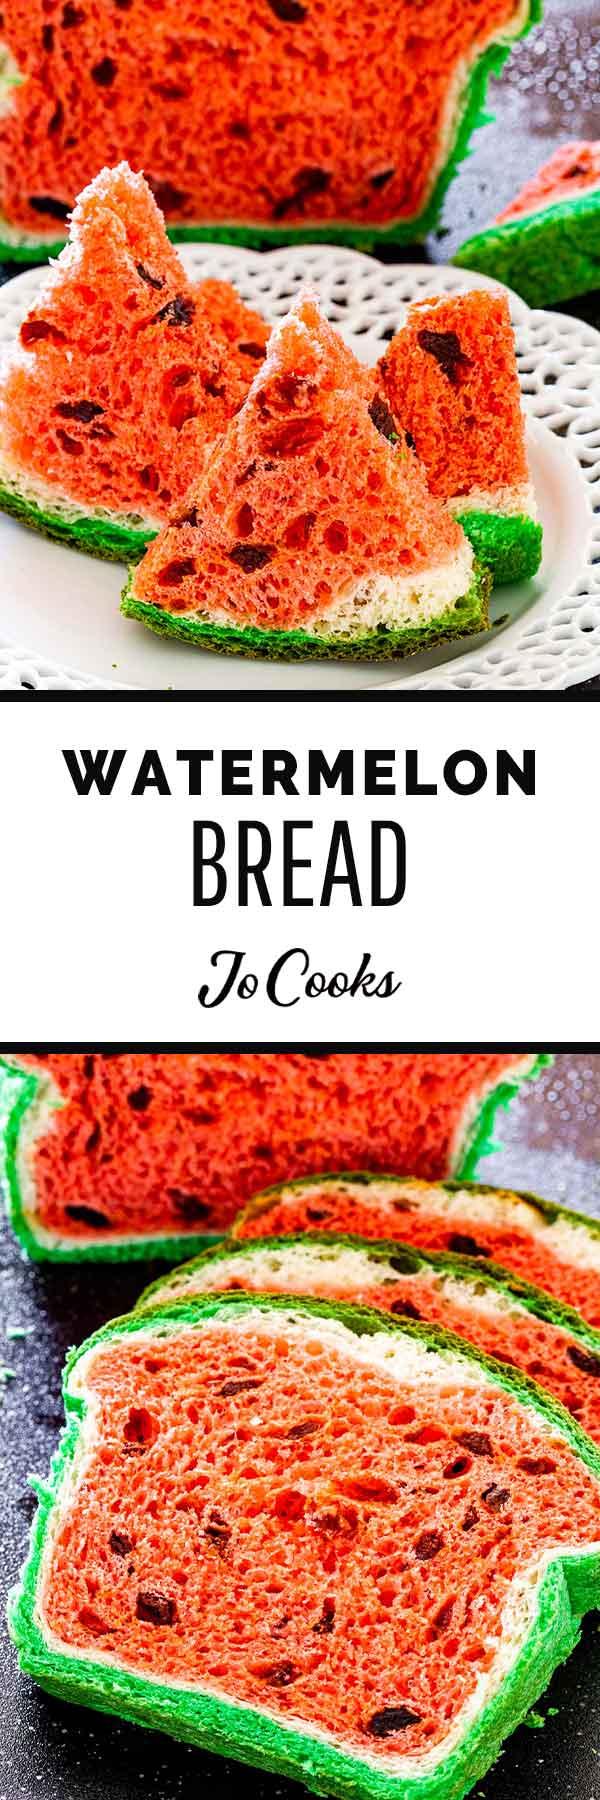 Watermelon Bread Jo Cooks